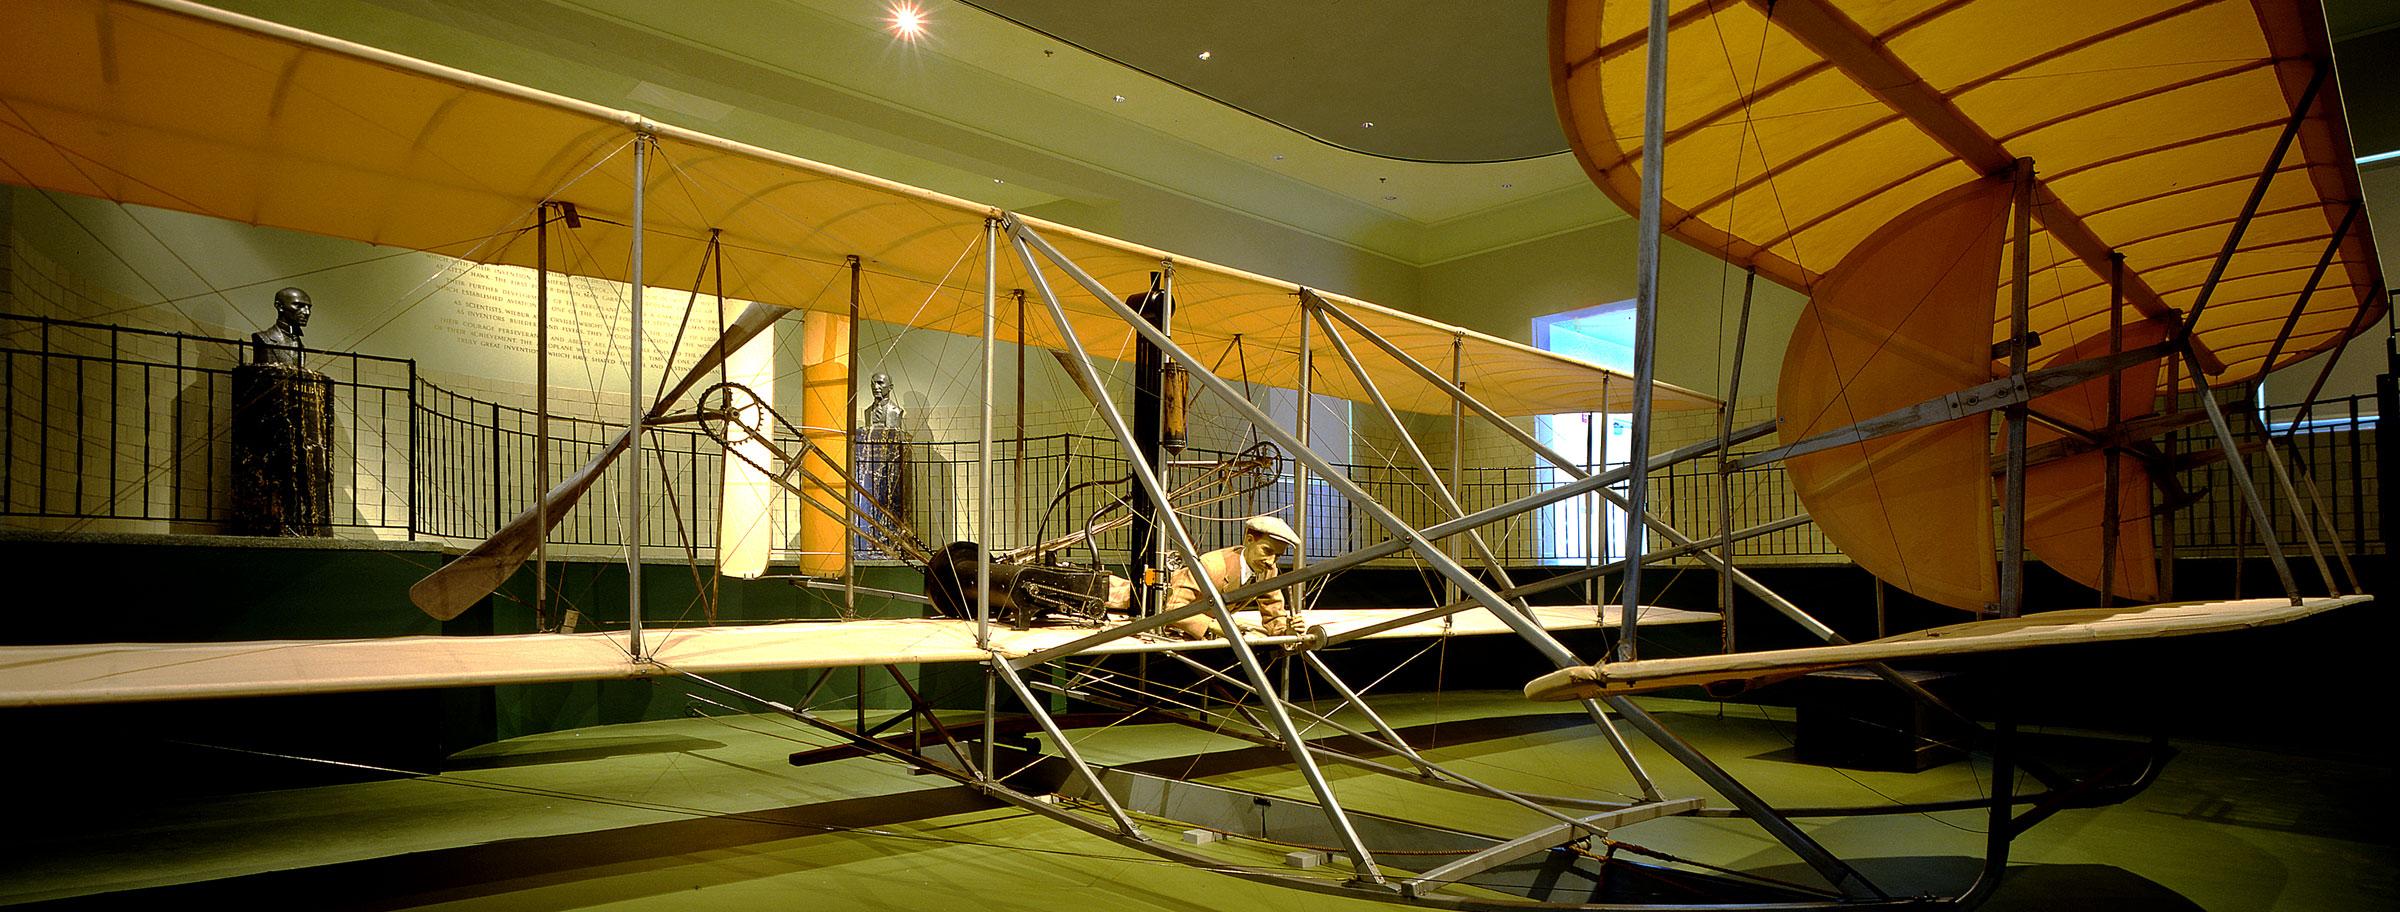 The 1905 Wright Flyer III